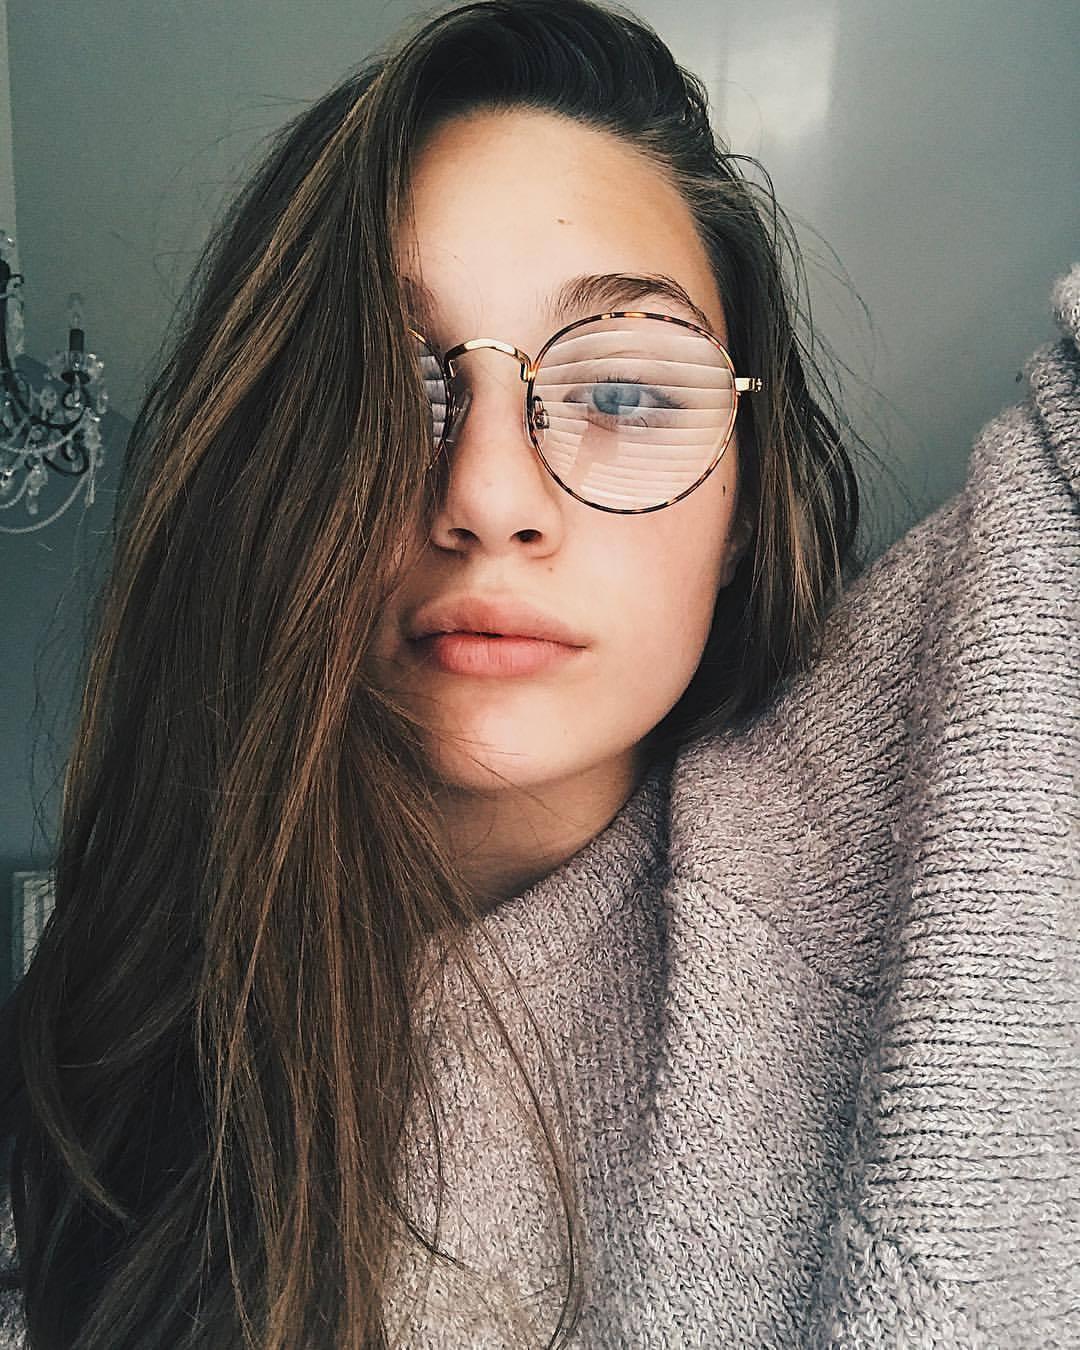 Maddie wearing glasses